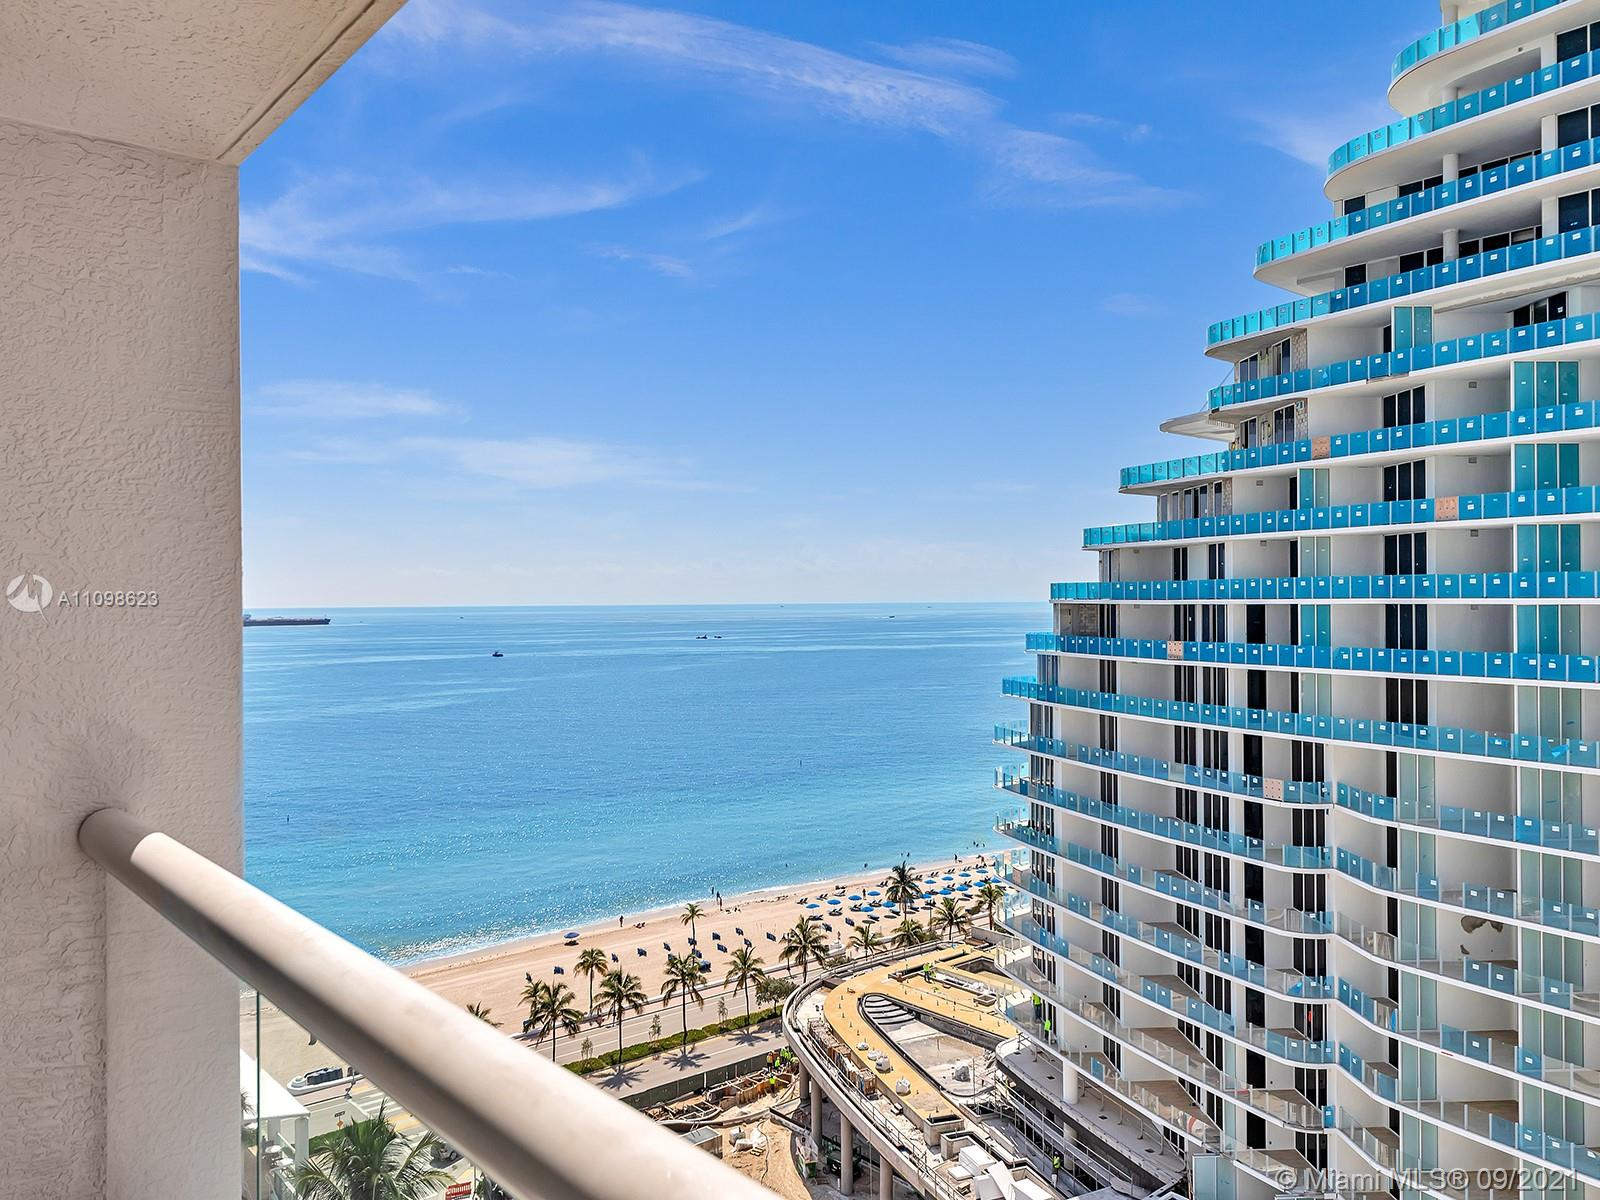 551 N Fort Lauderdale Beach Blvd #41